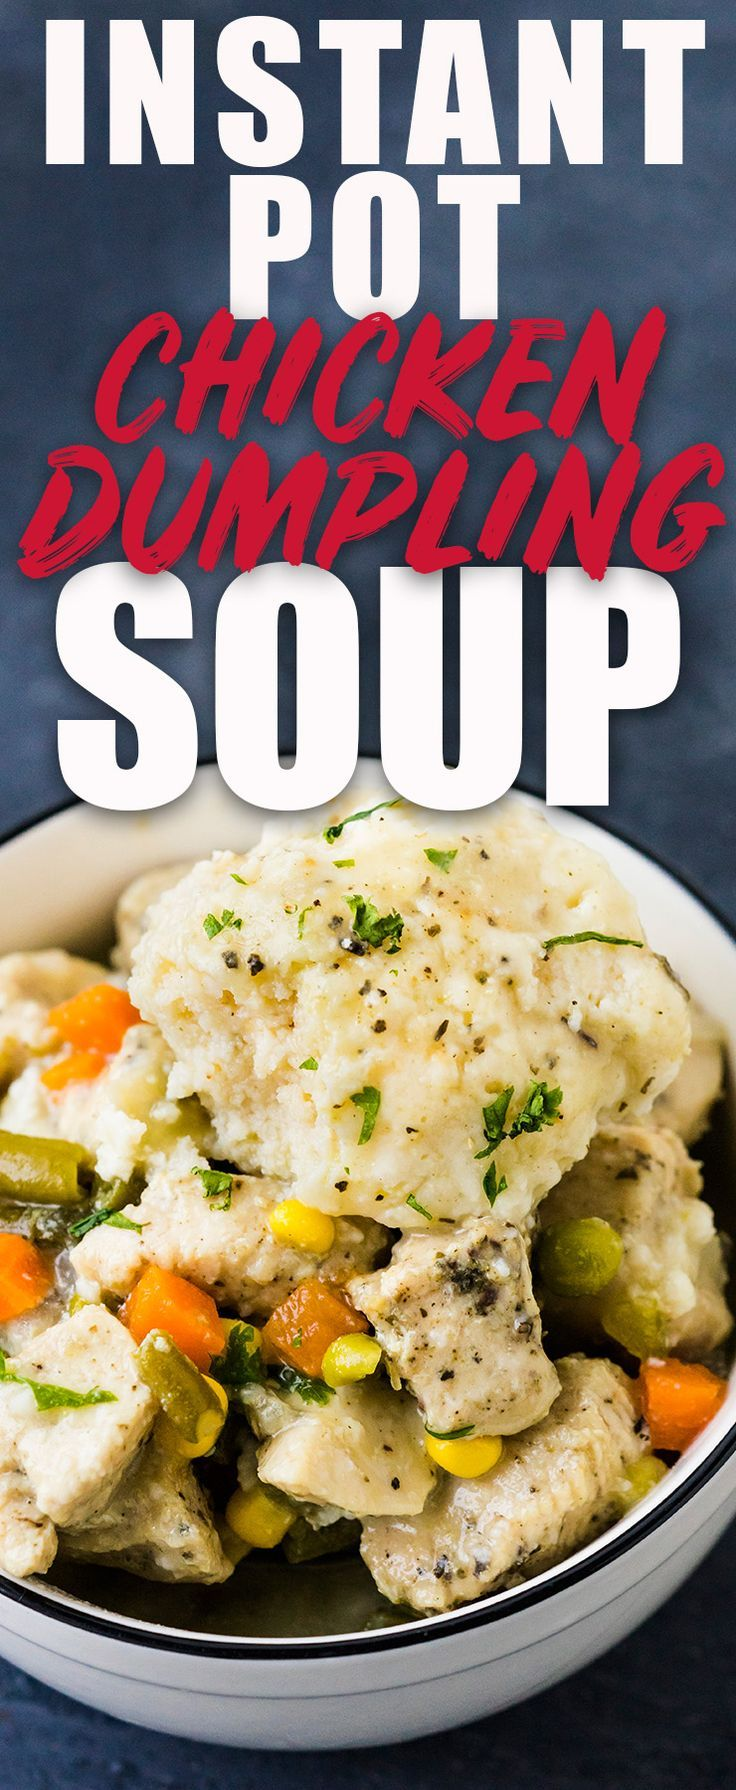 202 best heather likes dinner recipes images on pinterest crockpot instant pot chicken dumpling soup recipe instantpotrecipes chickenrecipes dinner forumfinder Image collections